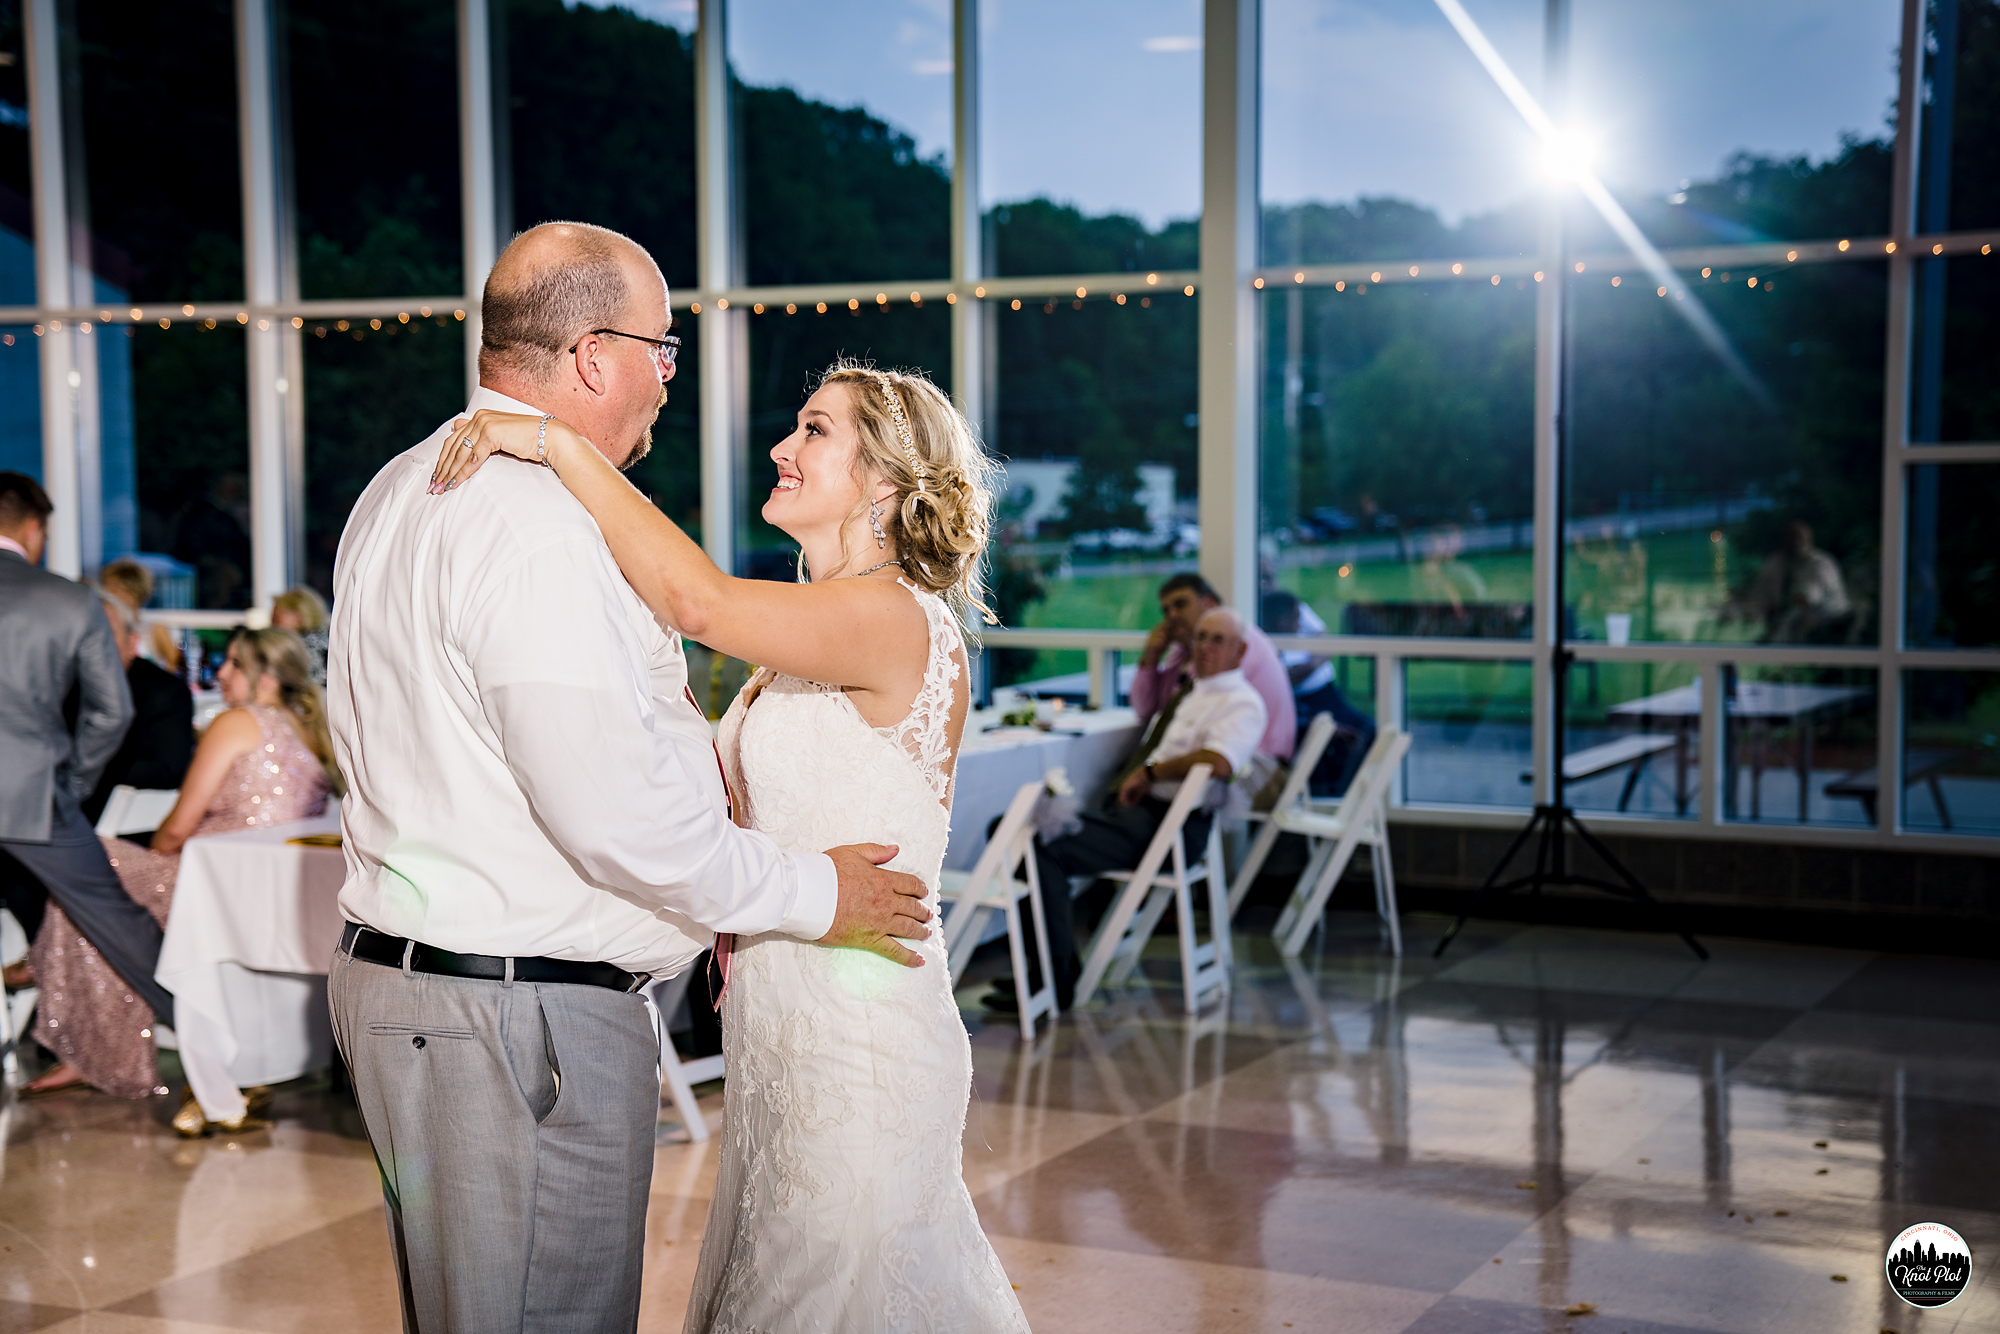 Southgate-Community-Center-KY-Wedding-Photography-27.jpg